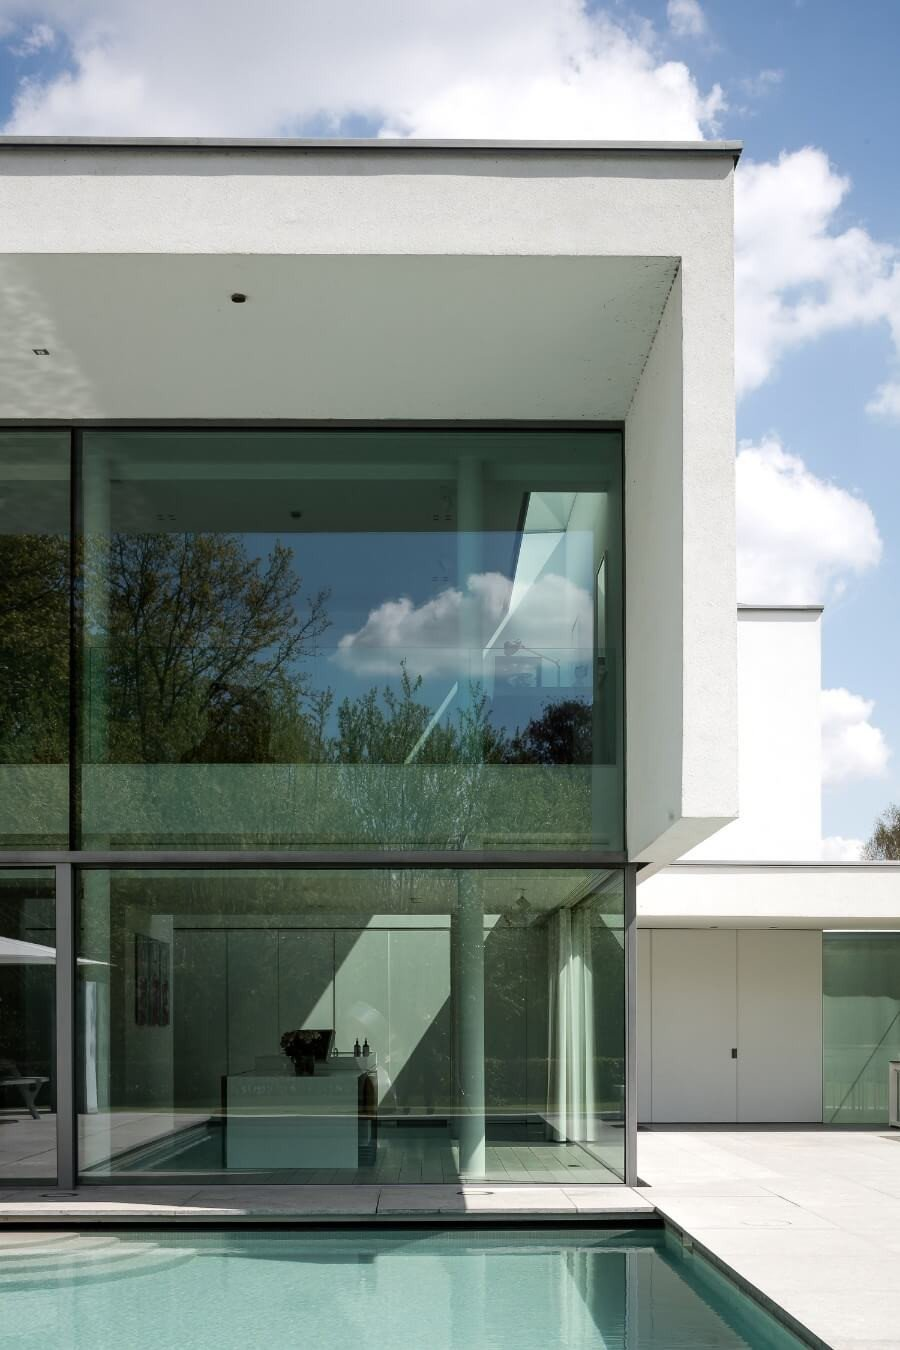 House-MP-Rietveldprojects-Photobycafeine-26